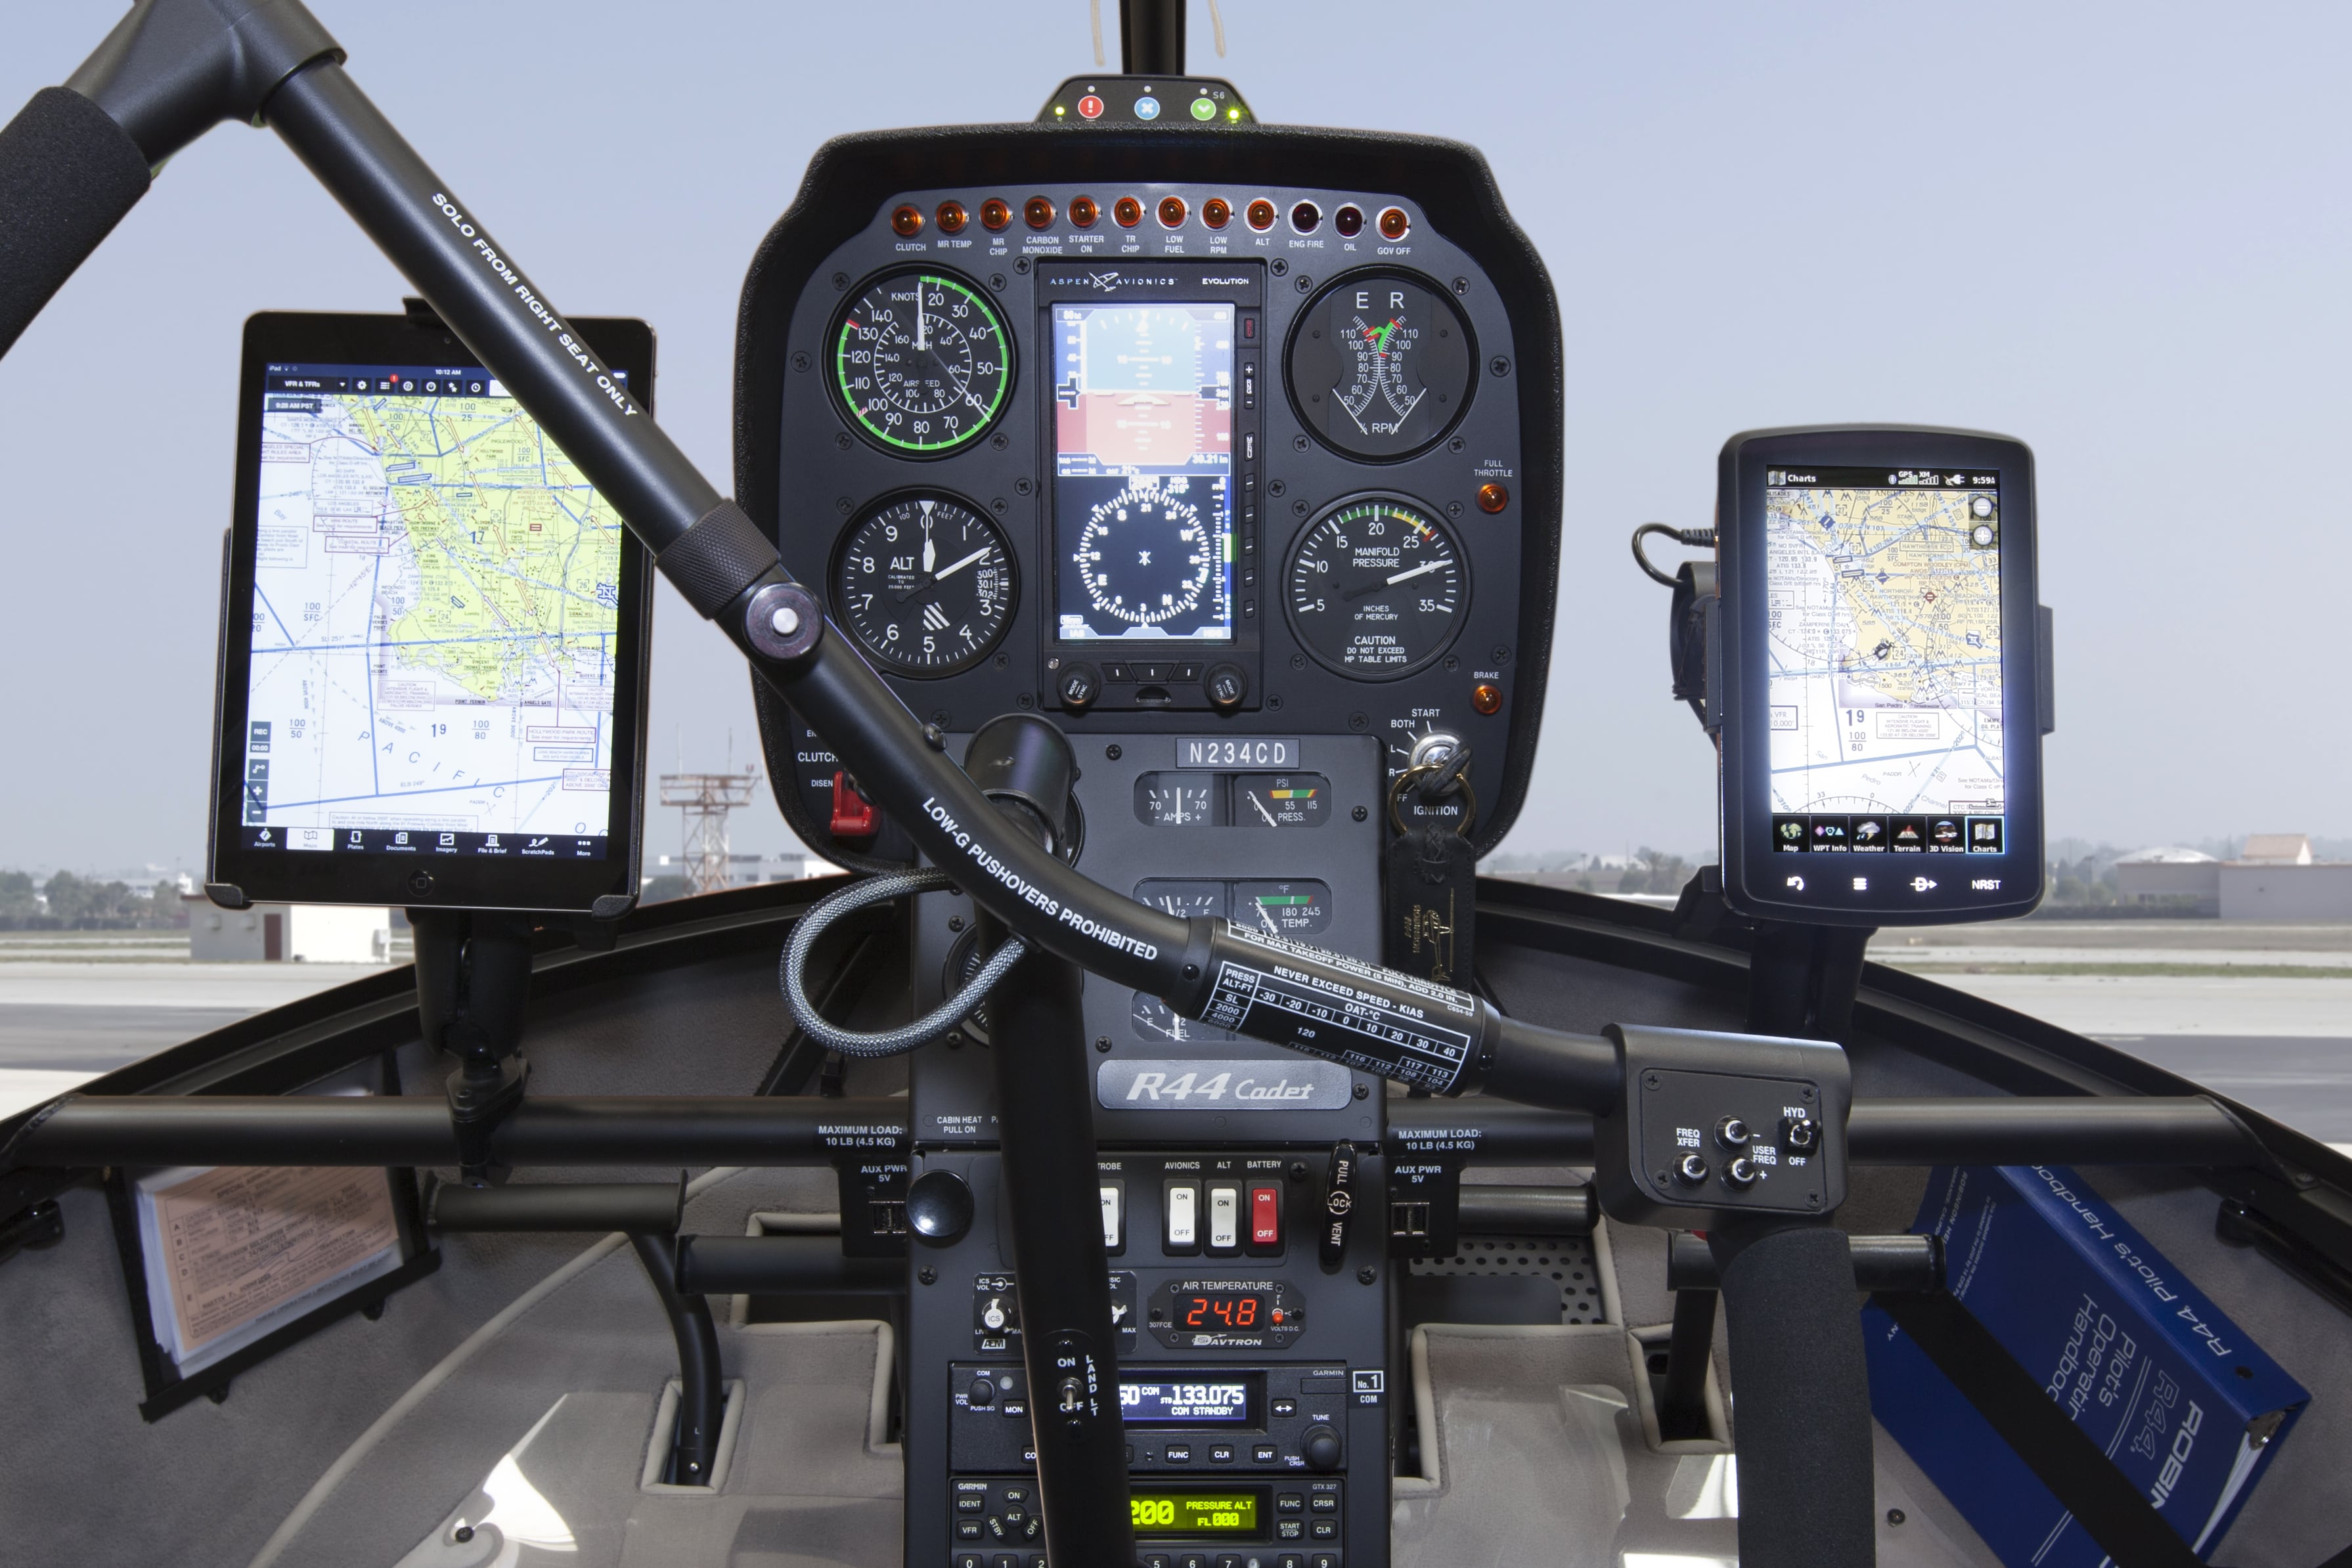 R44 Cadet  U2014 Image Gallery